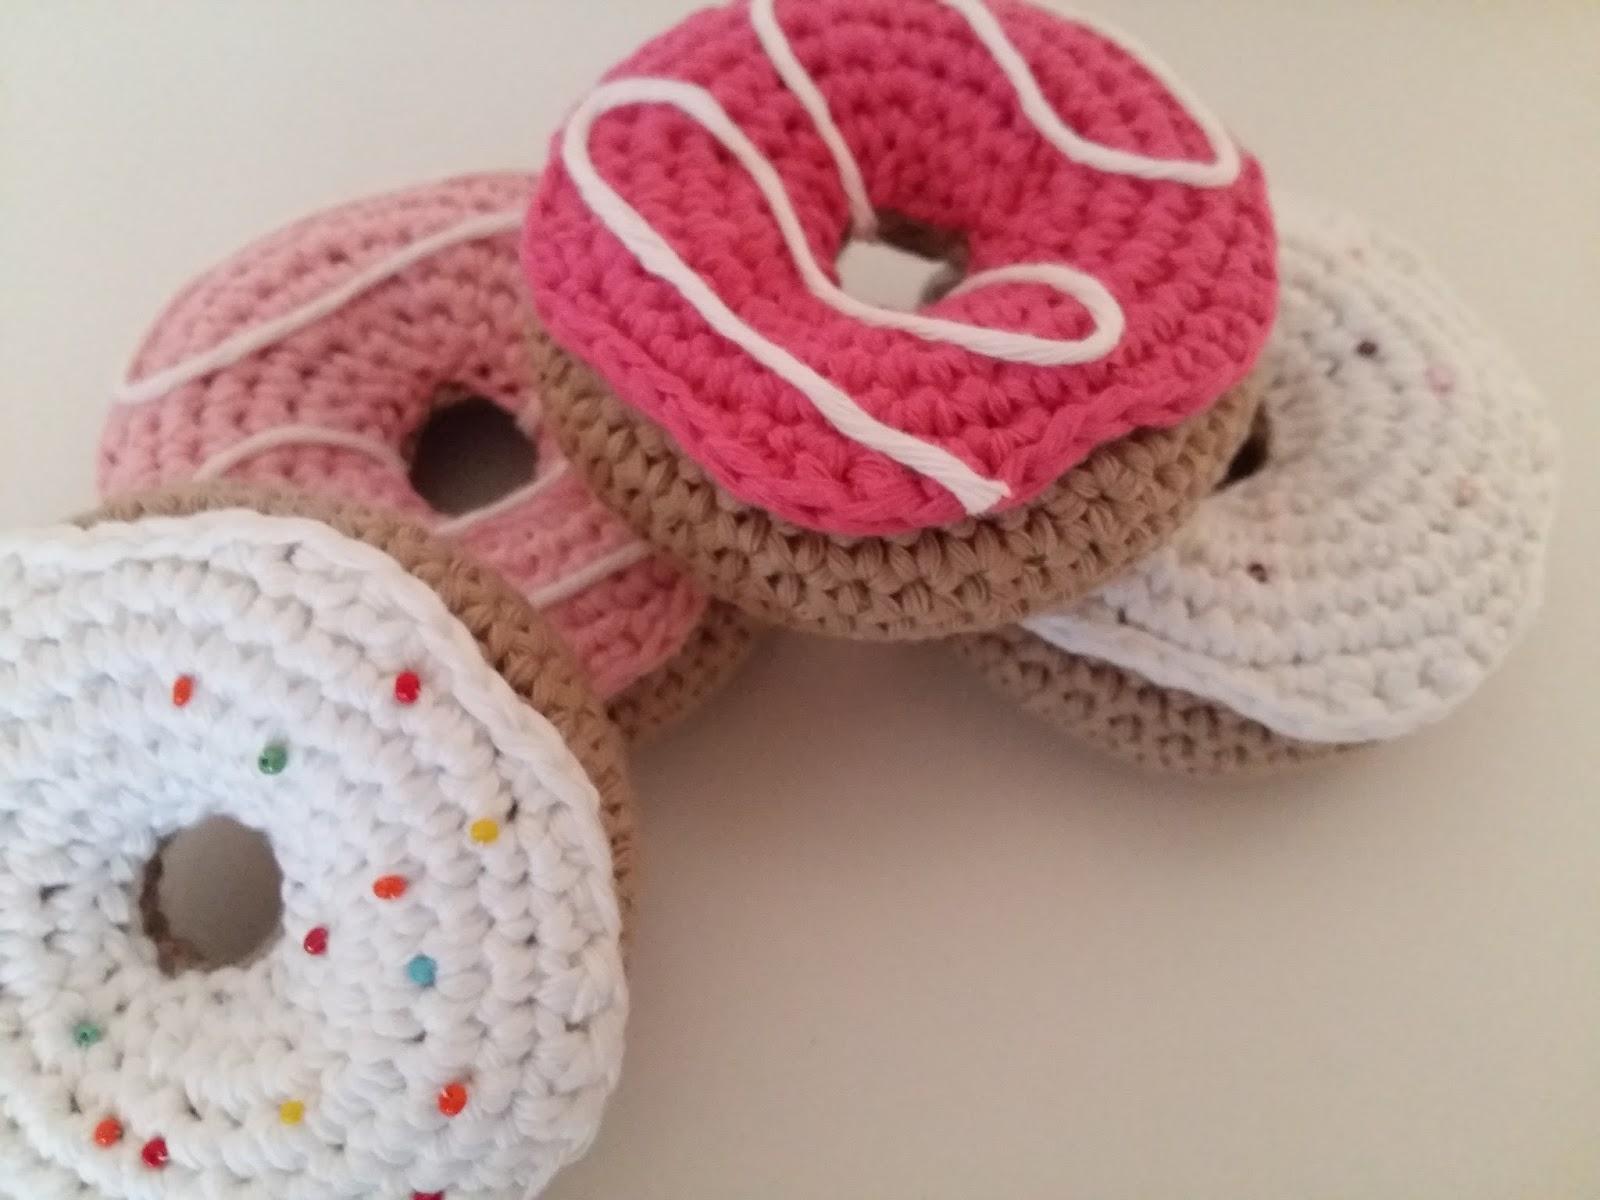 Amigurumi Tuto : Fée du tricot donuts au crochet tuto inside